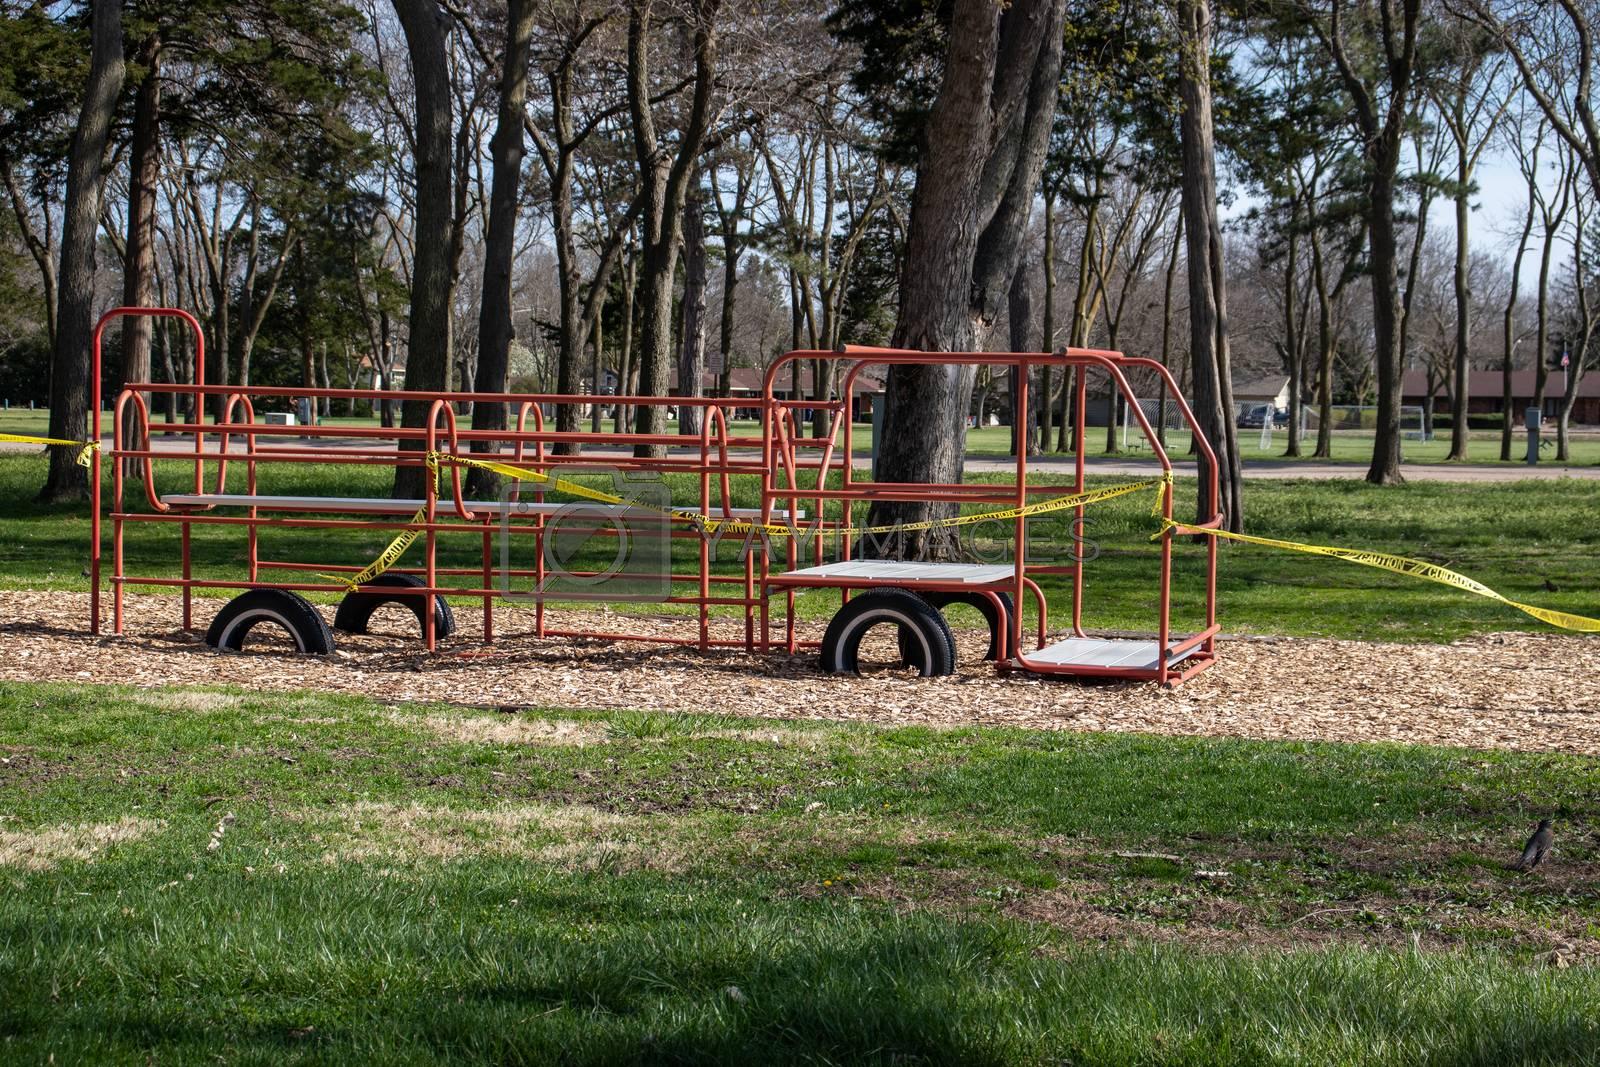 Hall County Taken 4-26-2020 Stolley Park Kids Kingdom Grand Island Nebraska Taped Off Covid-19. High quality photo